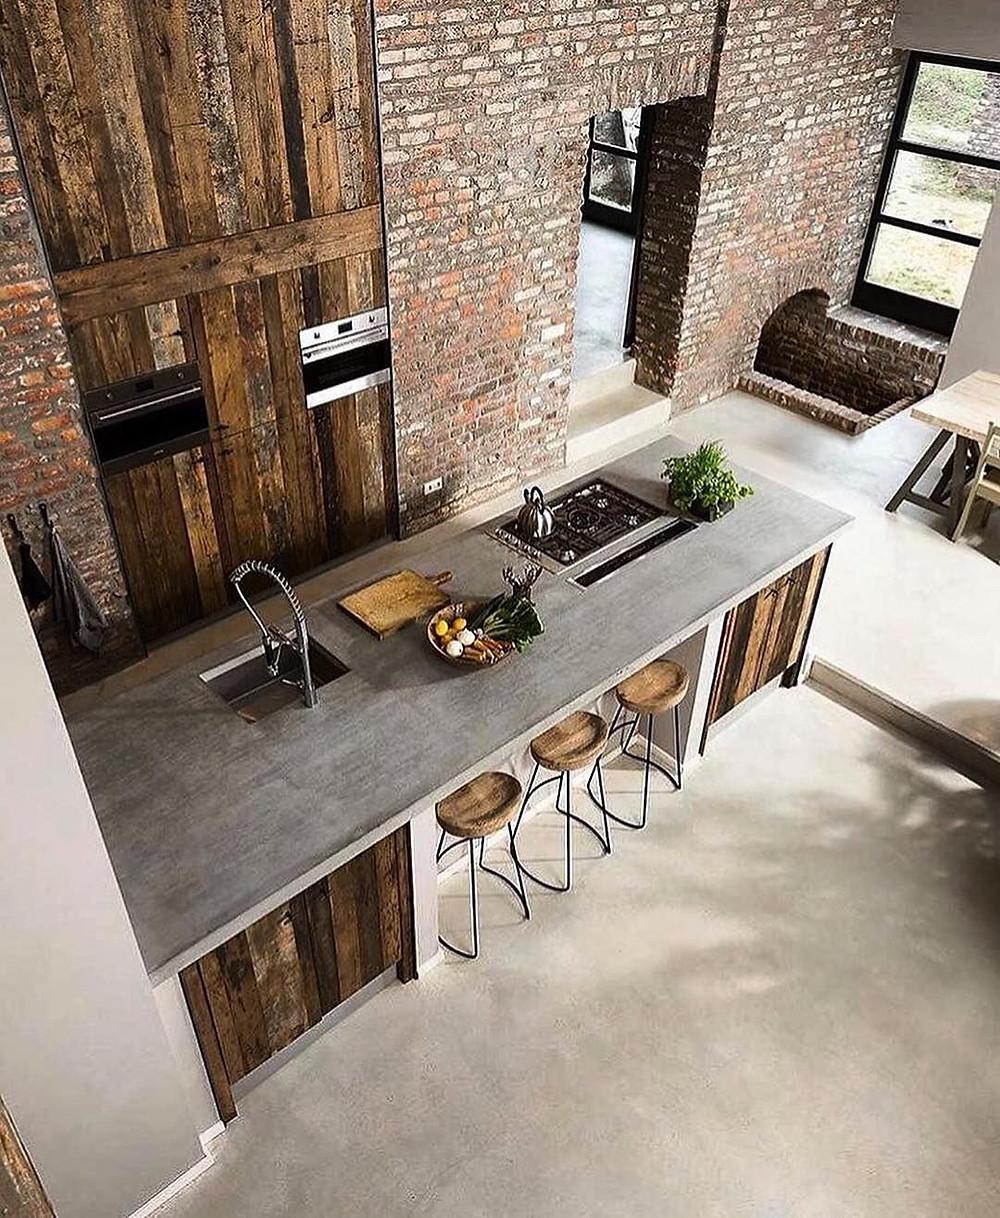 Concrete Kitchen Interior design